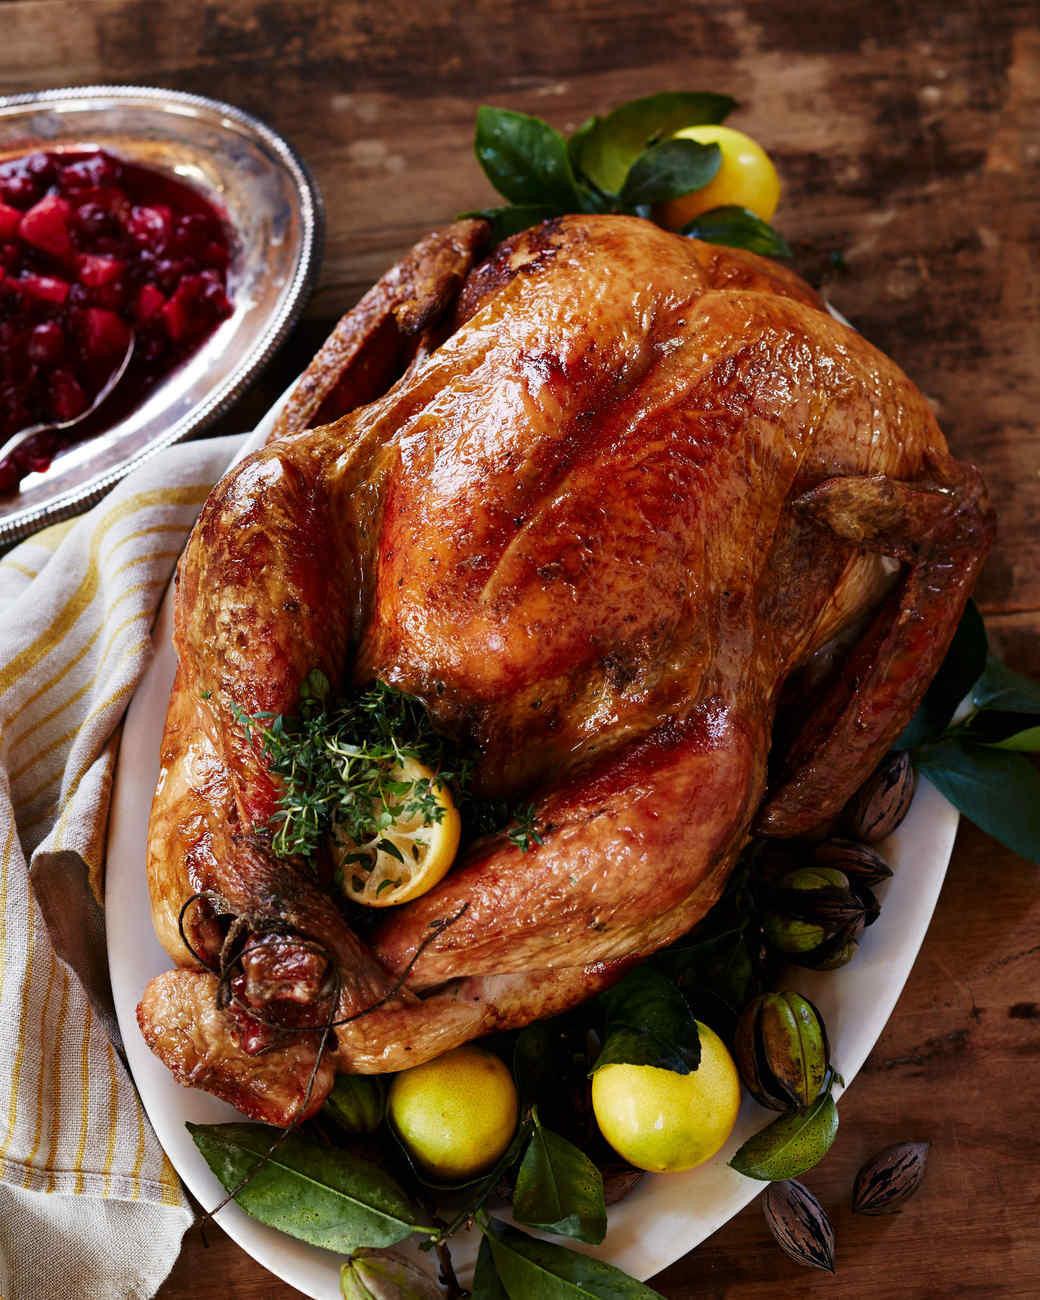 Martha Stewart Thanksgiving Turkey  A Virginia Family s Thanksgiving Recipes